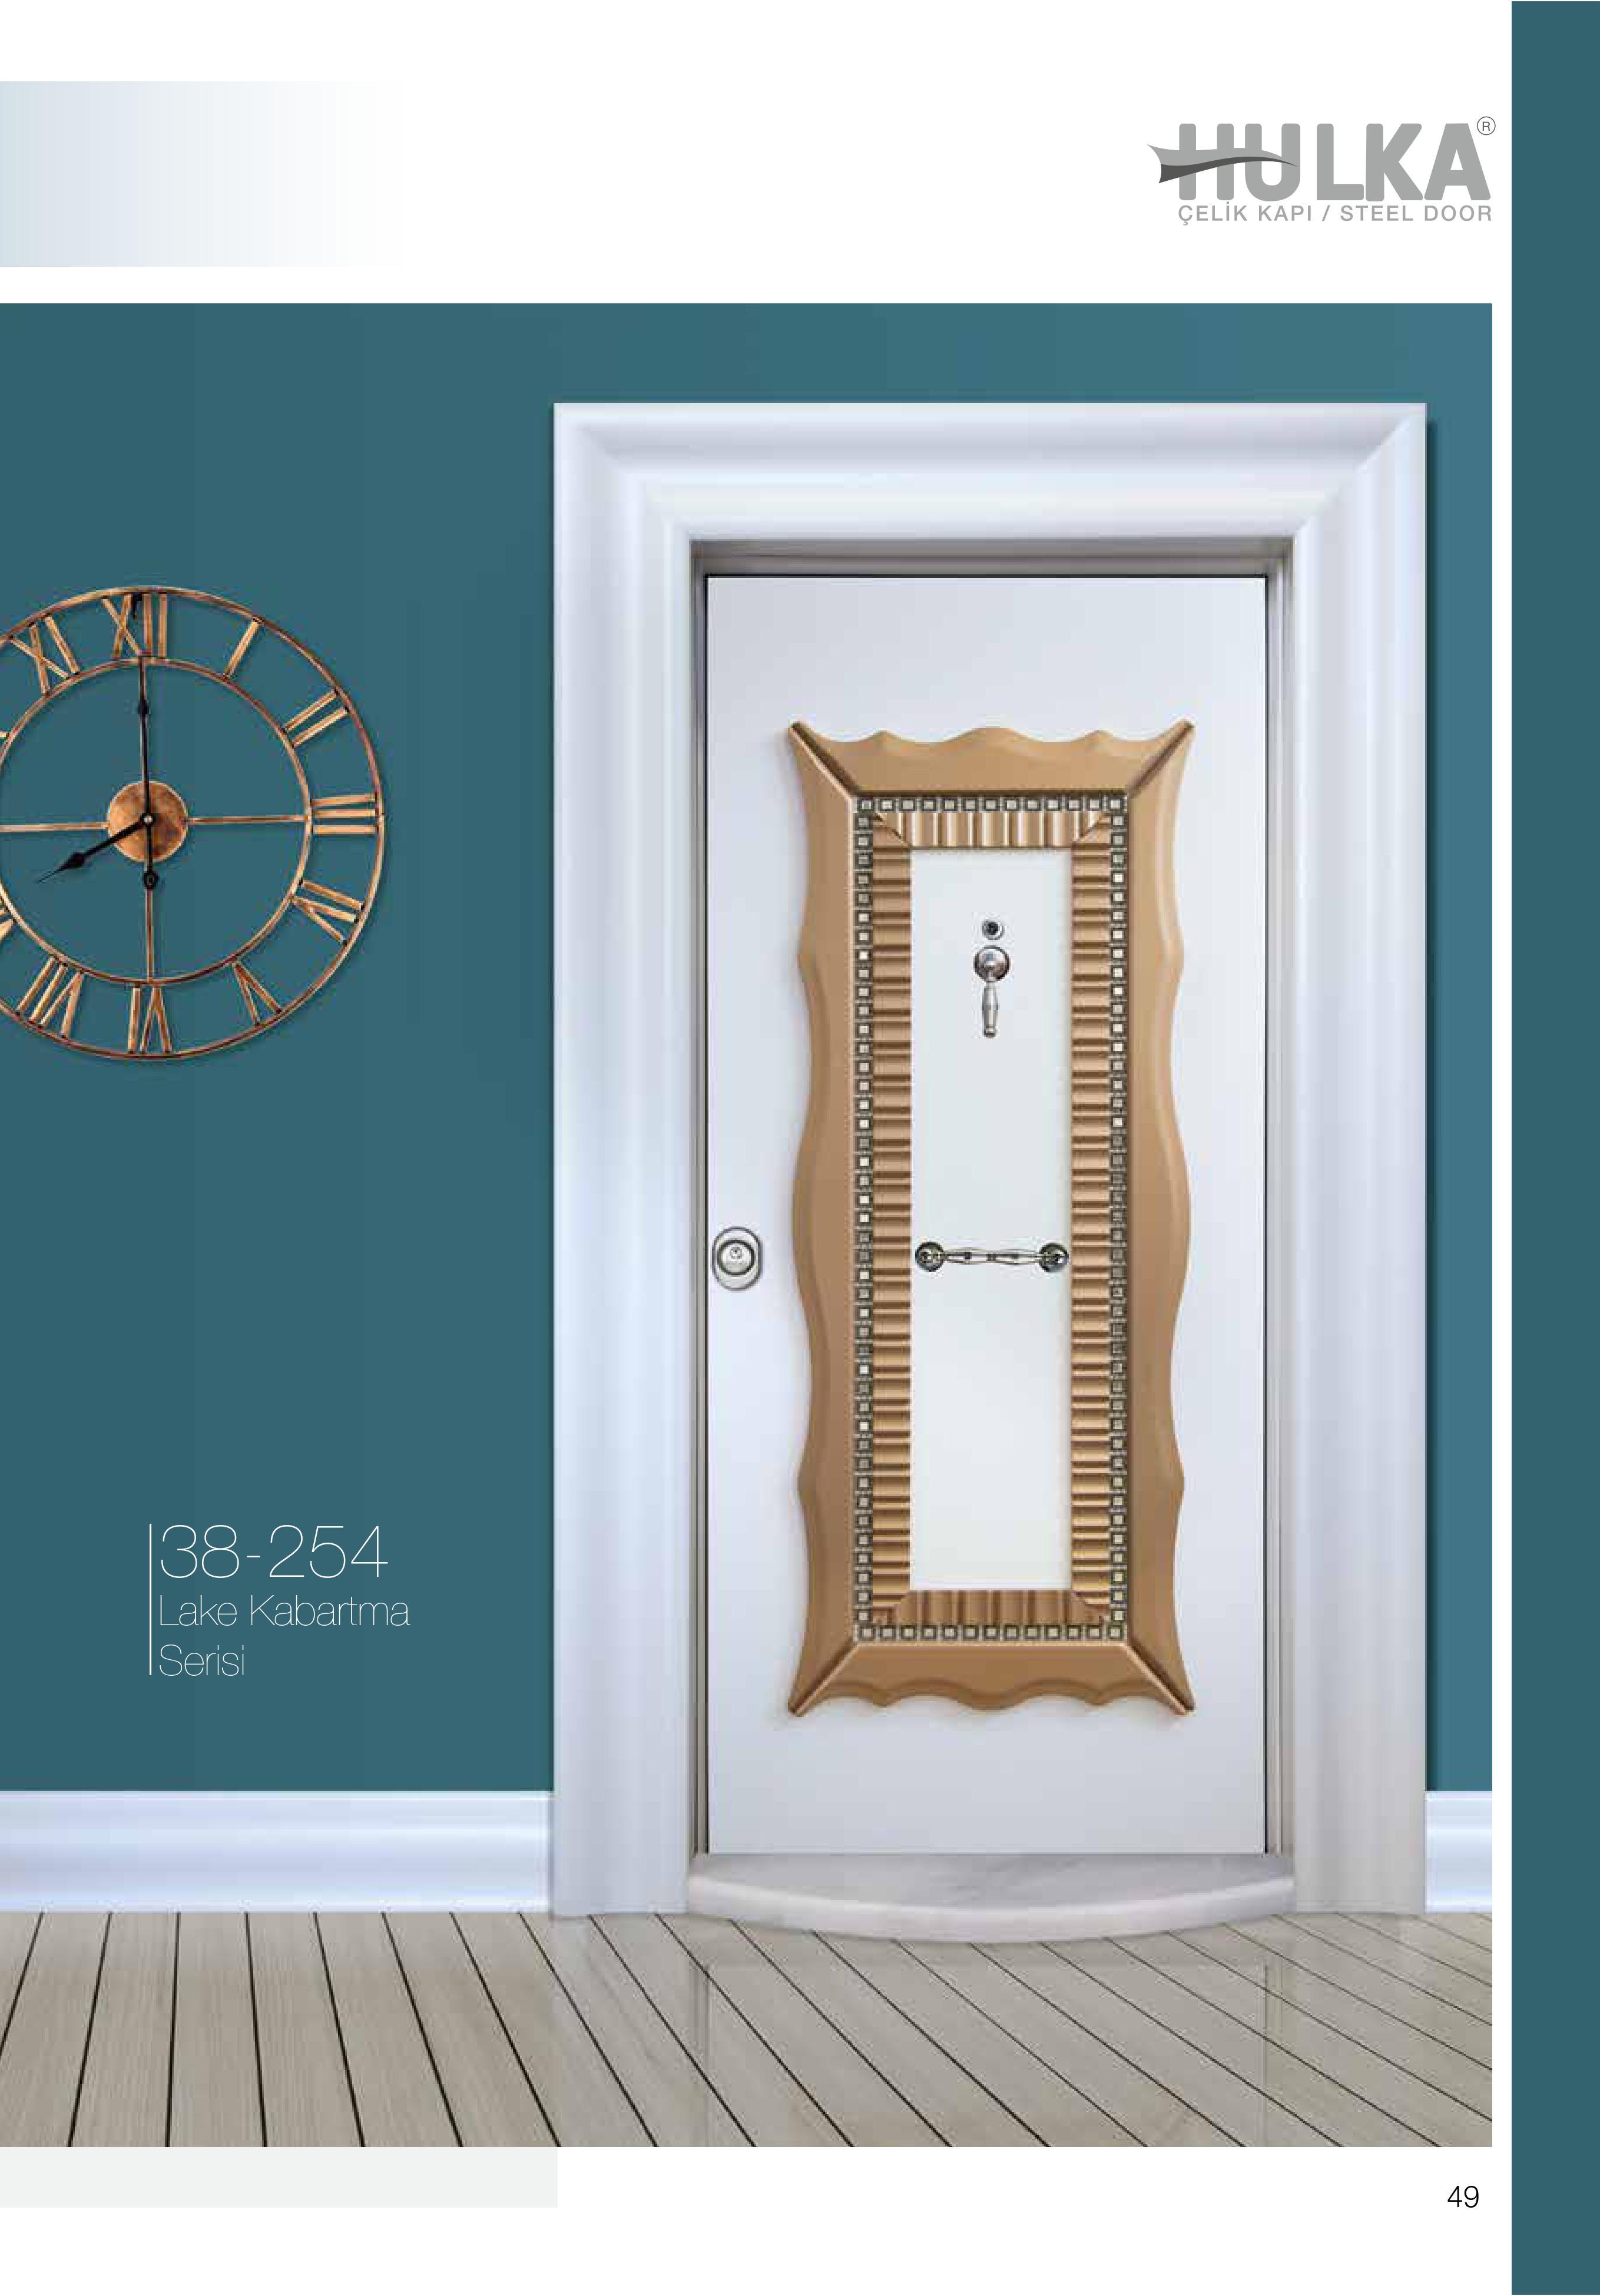 HULKA STEEL DOOR COMPANY - Household Products1.com